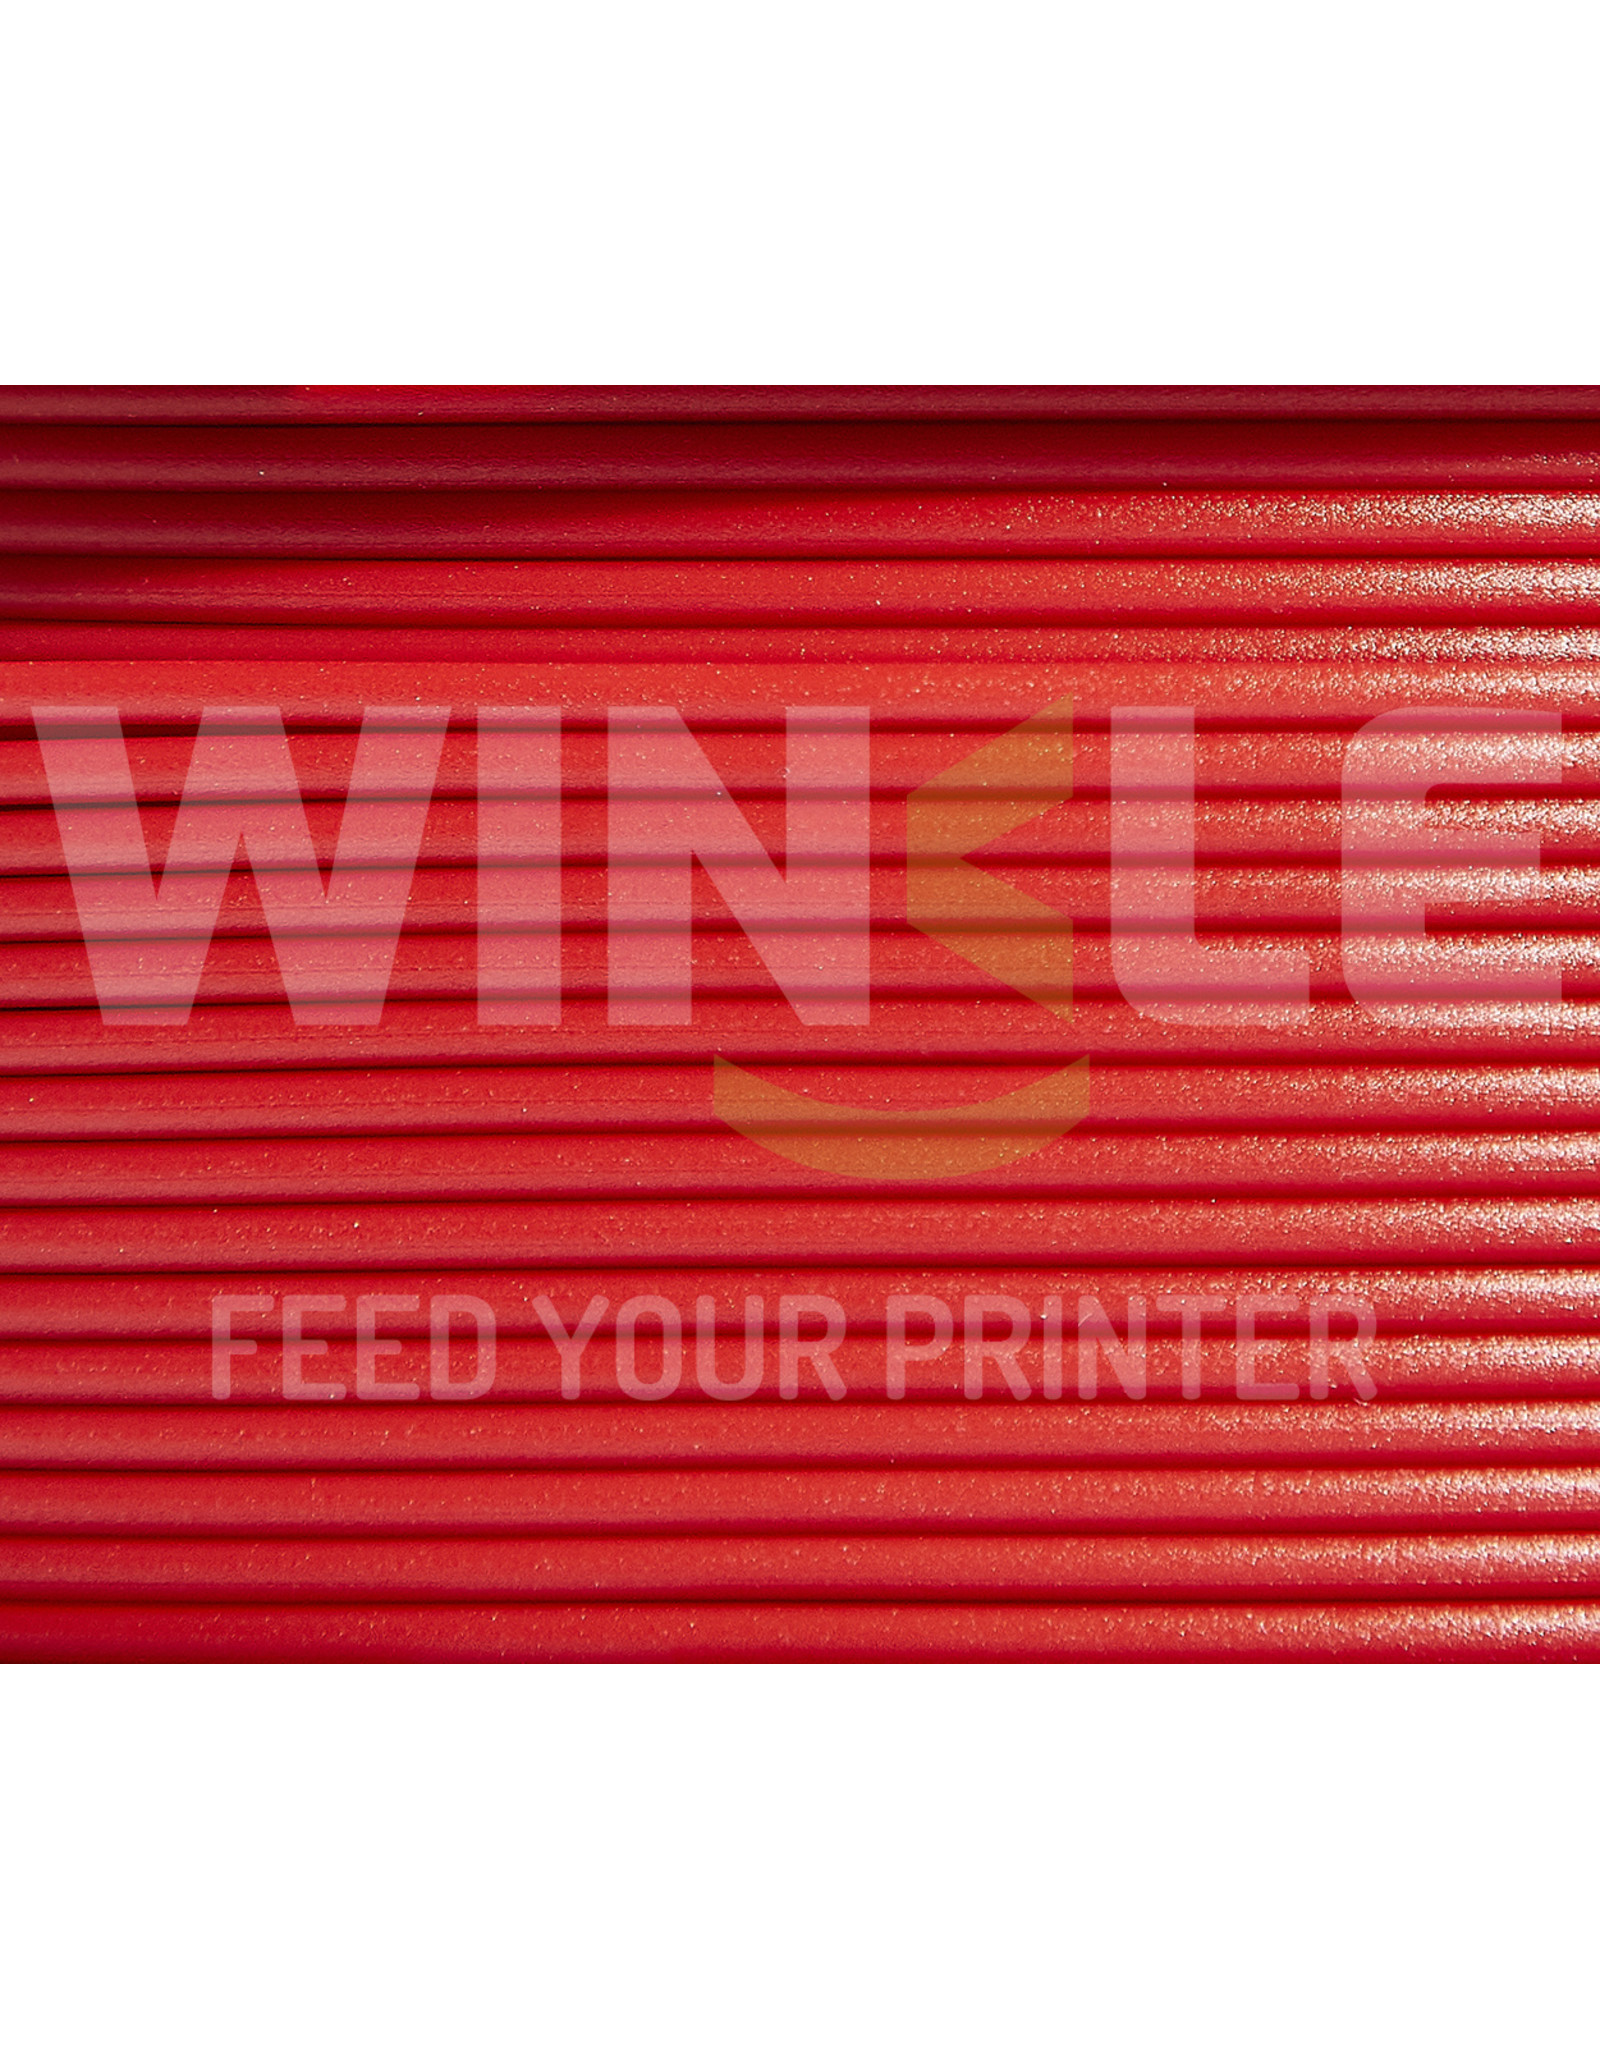 WINKLE PLA IE 870 WINKLE 1kg Diable rouge